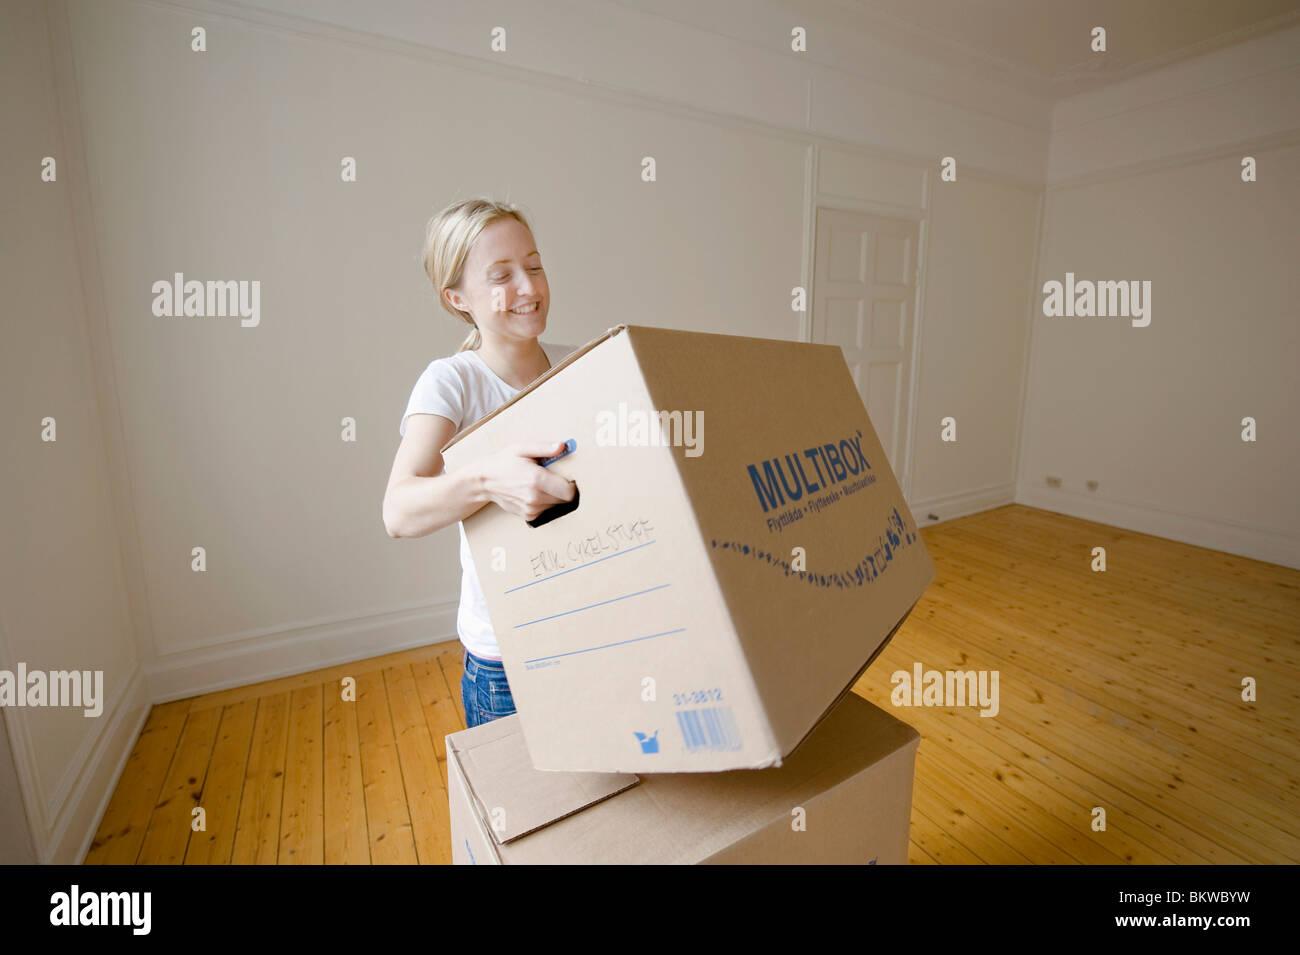 Girl lifting heavy moving box - Stock Image